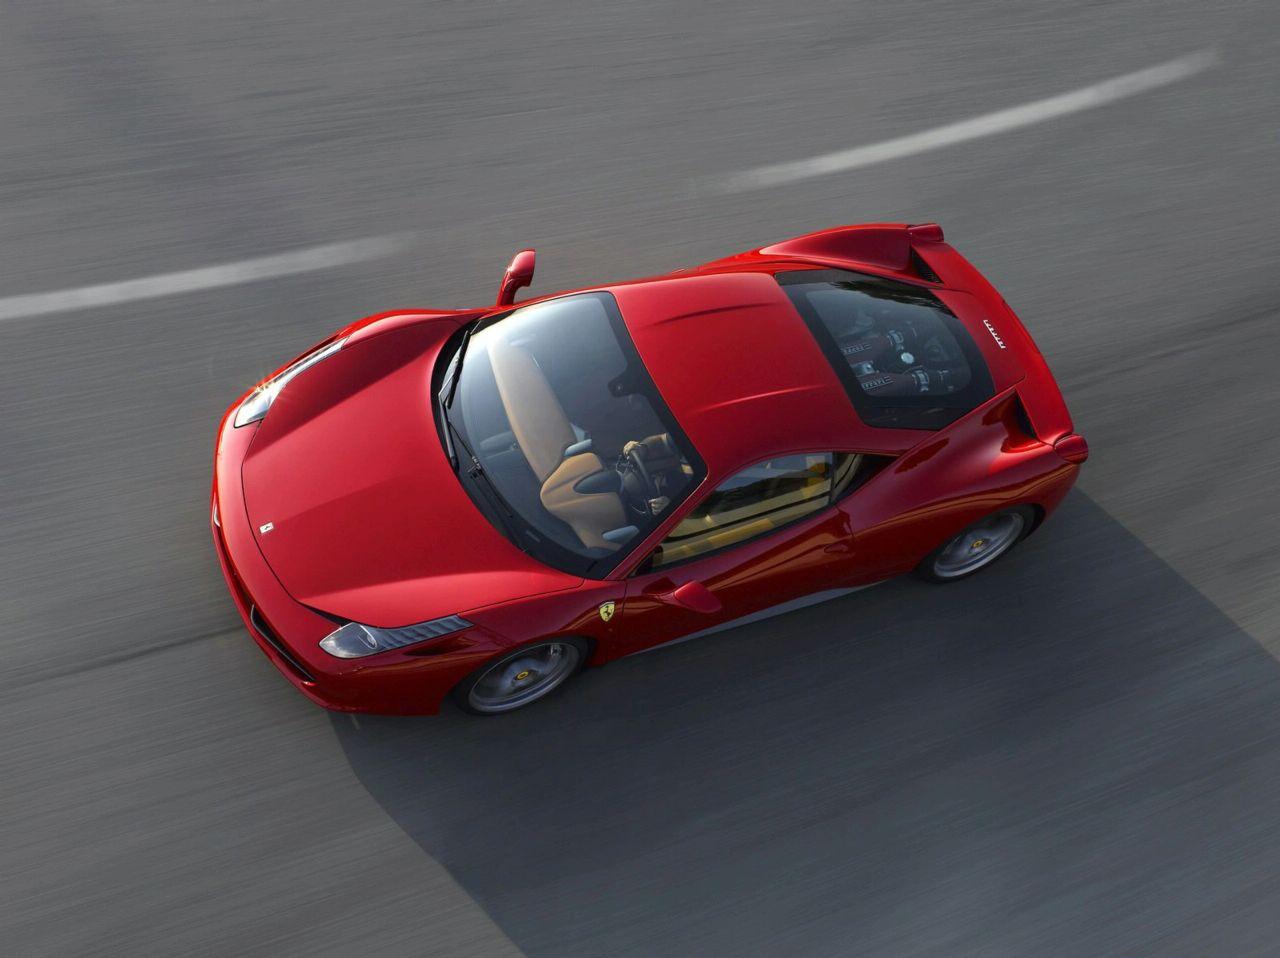 Like every Ferrari, 458 Italia